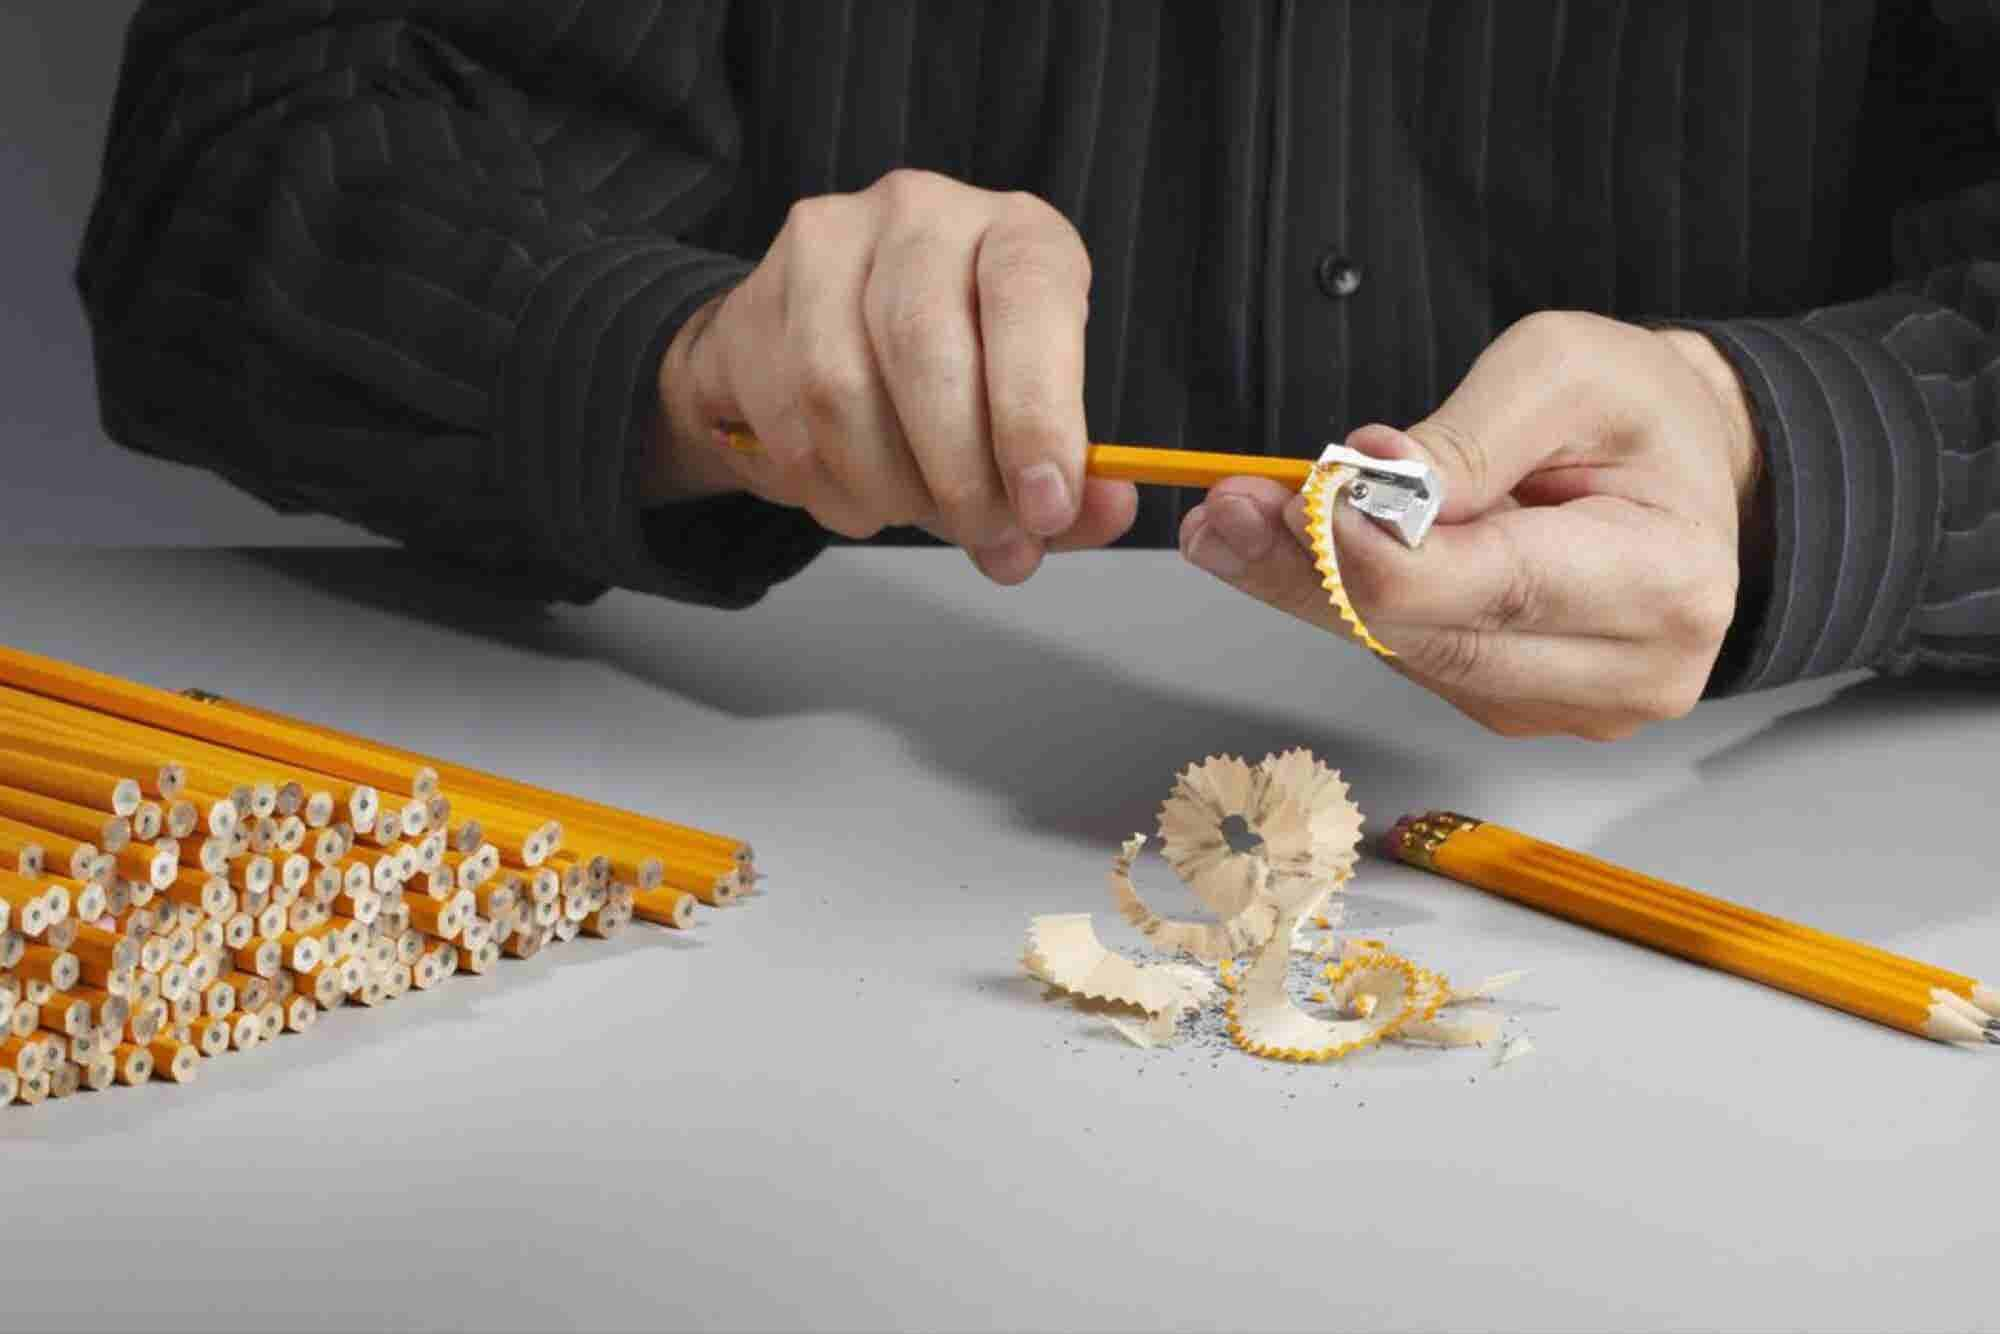 How Busy Entrepreneurs Deal With Mundane Tasks